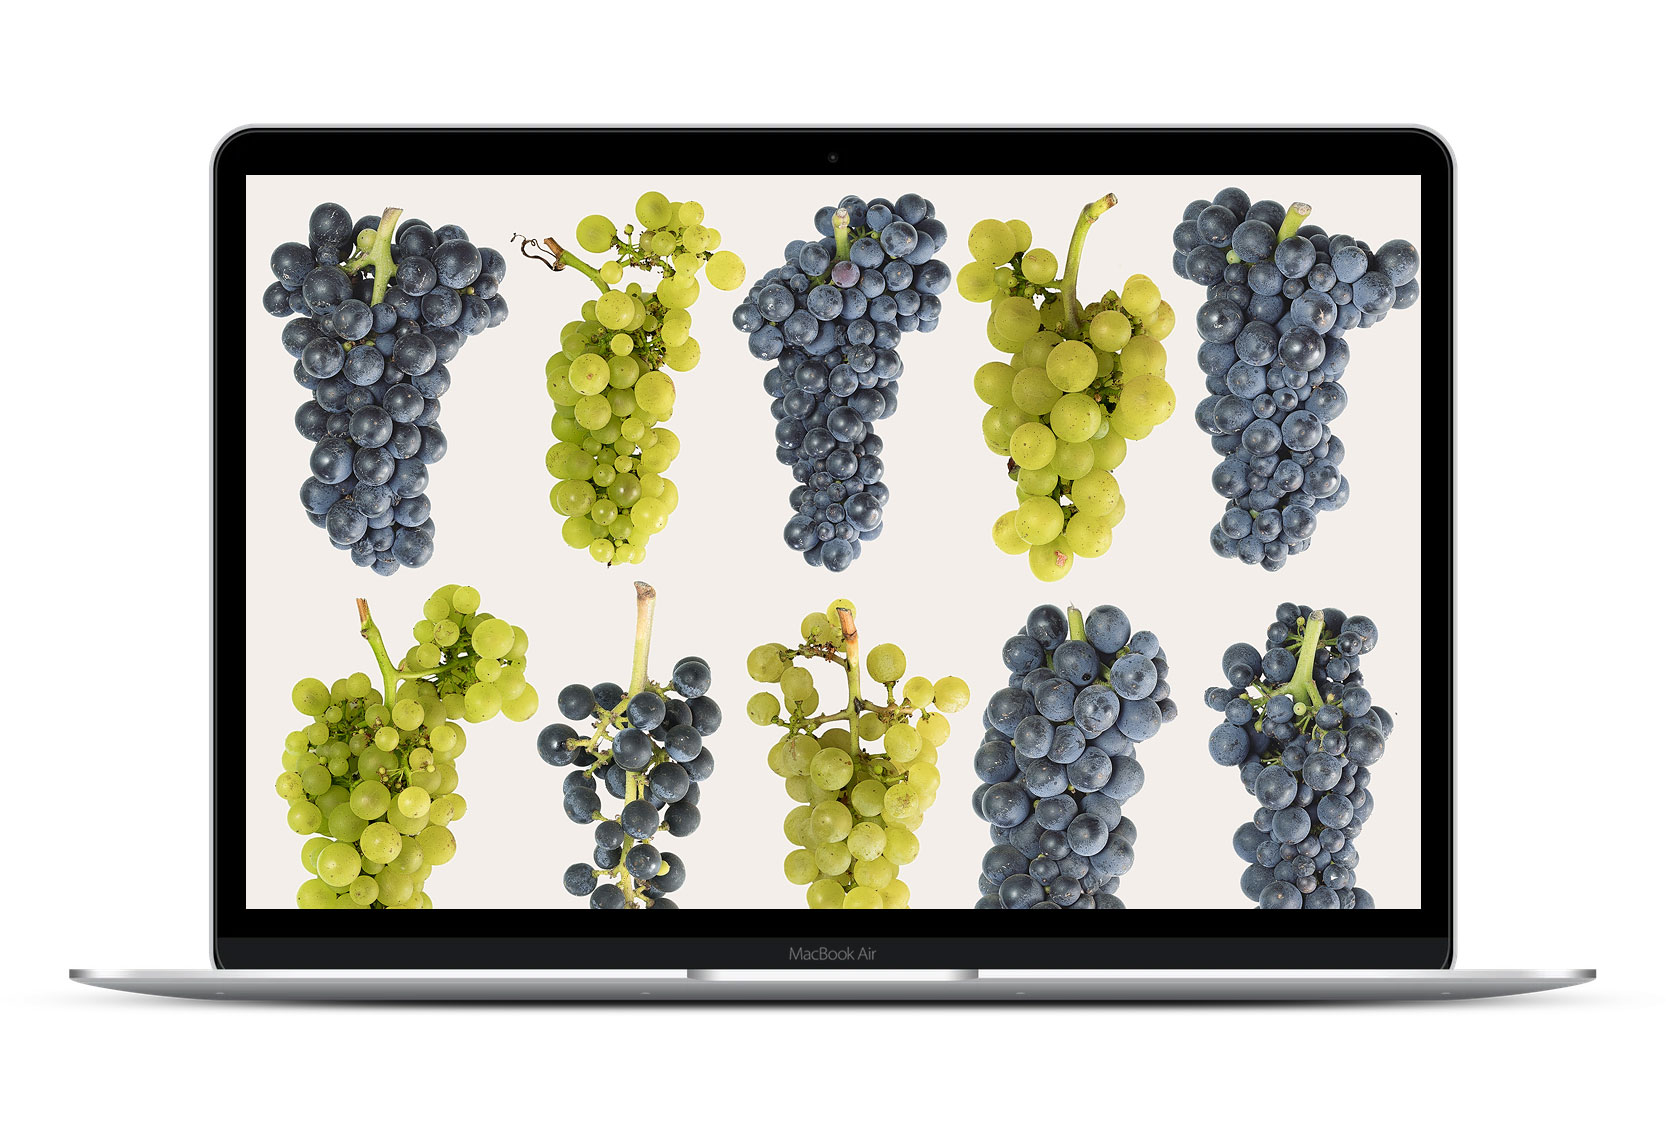 Best winery websites 2020